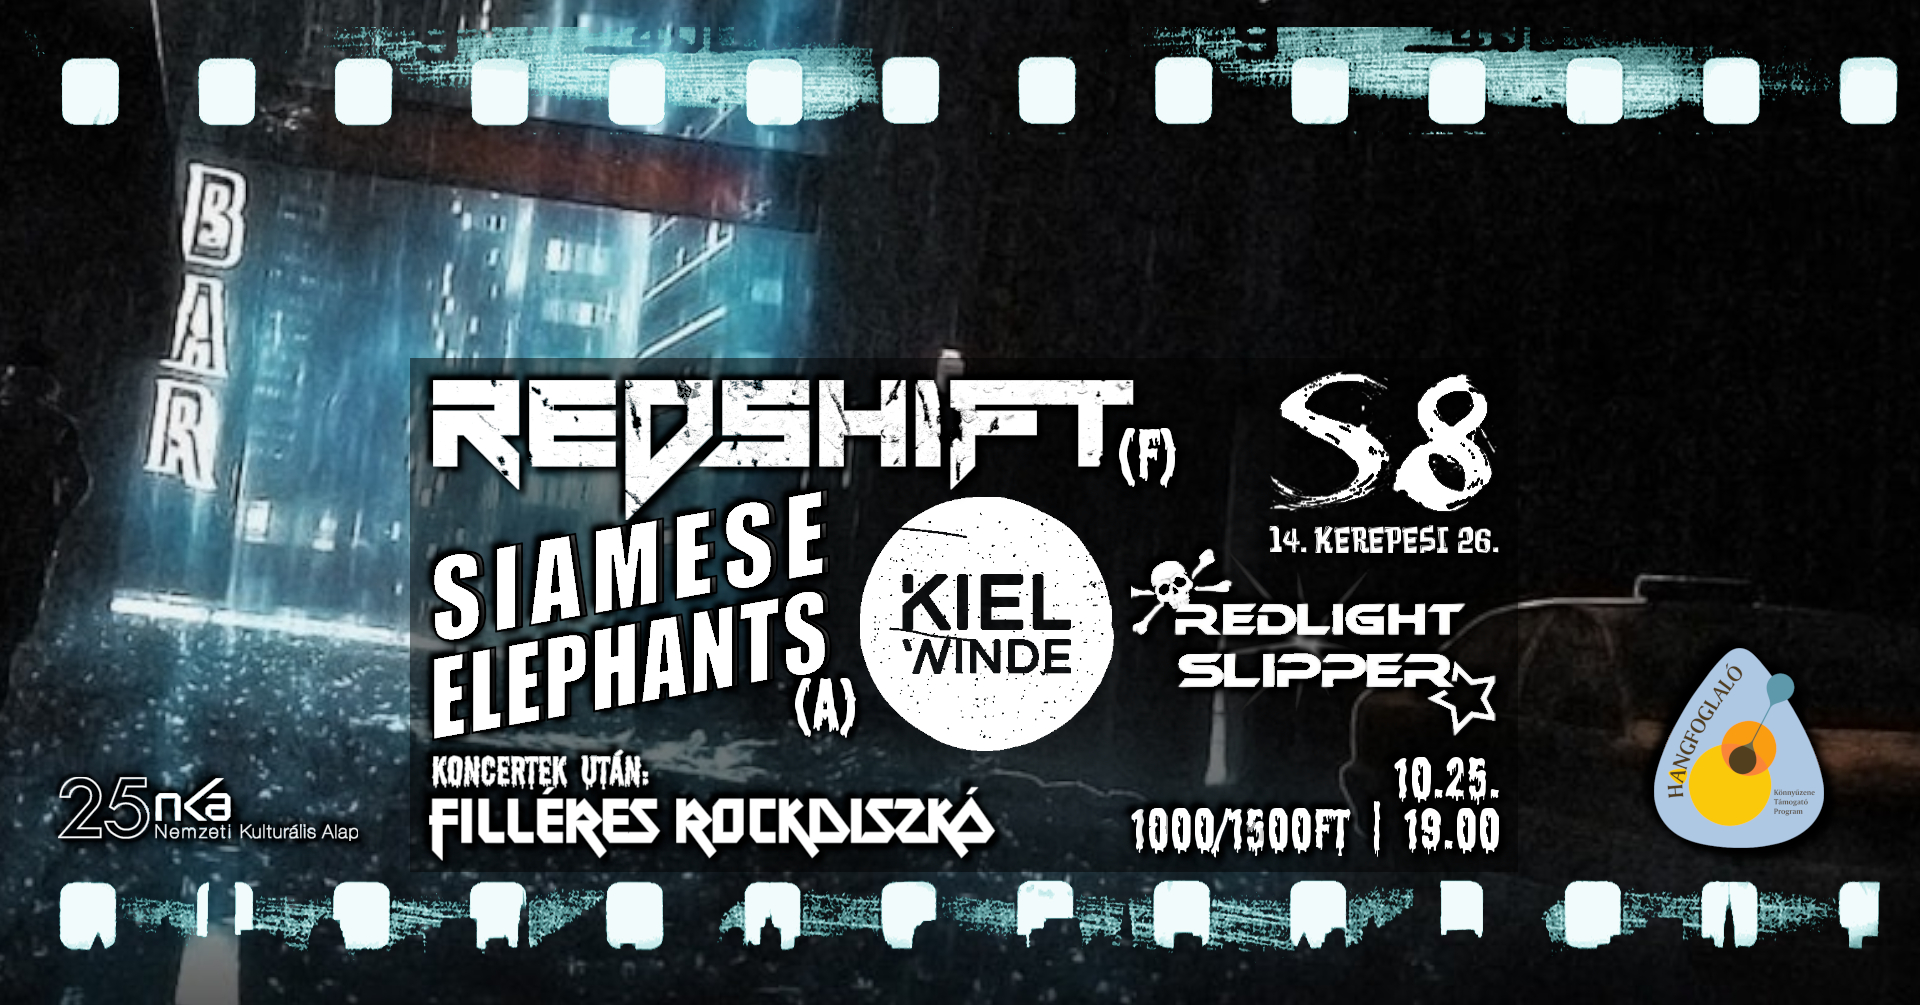 Redshift [F] I Siamese Elephants [A] I Redlight Slipper I Kiel Wind